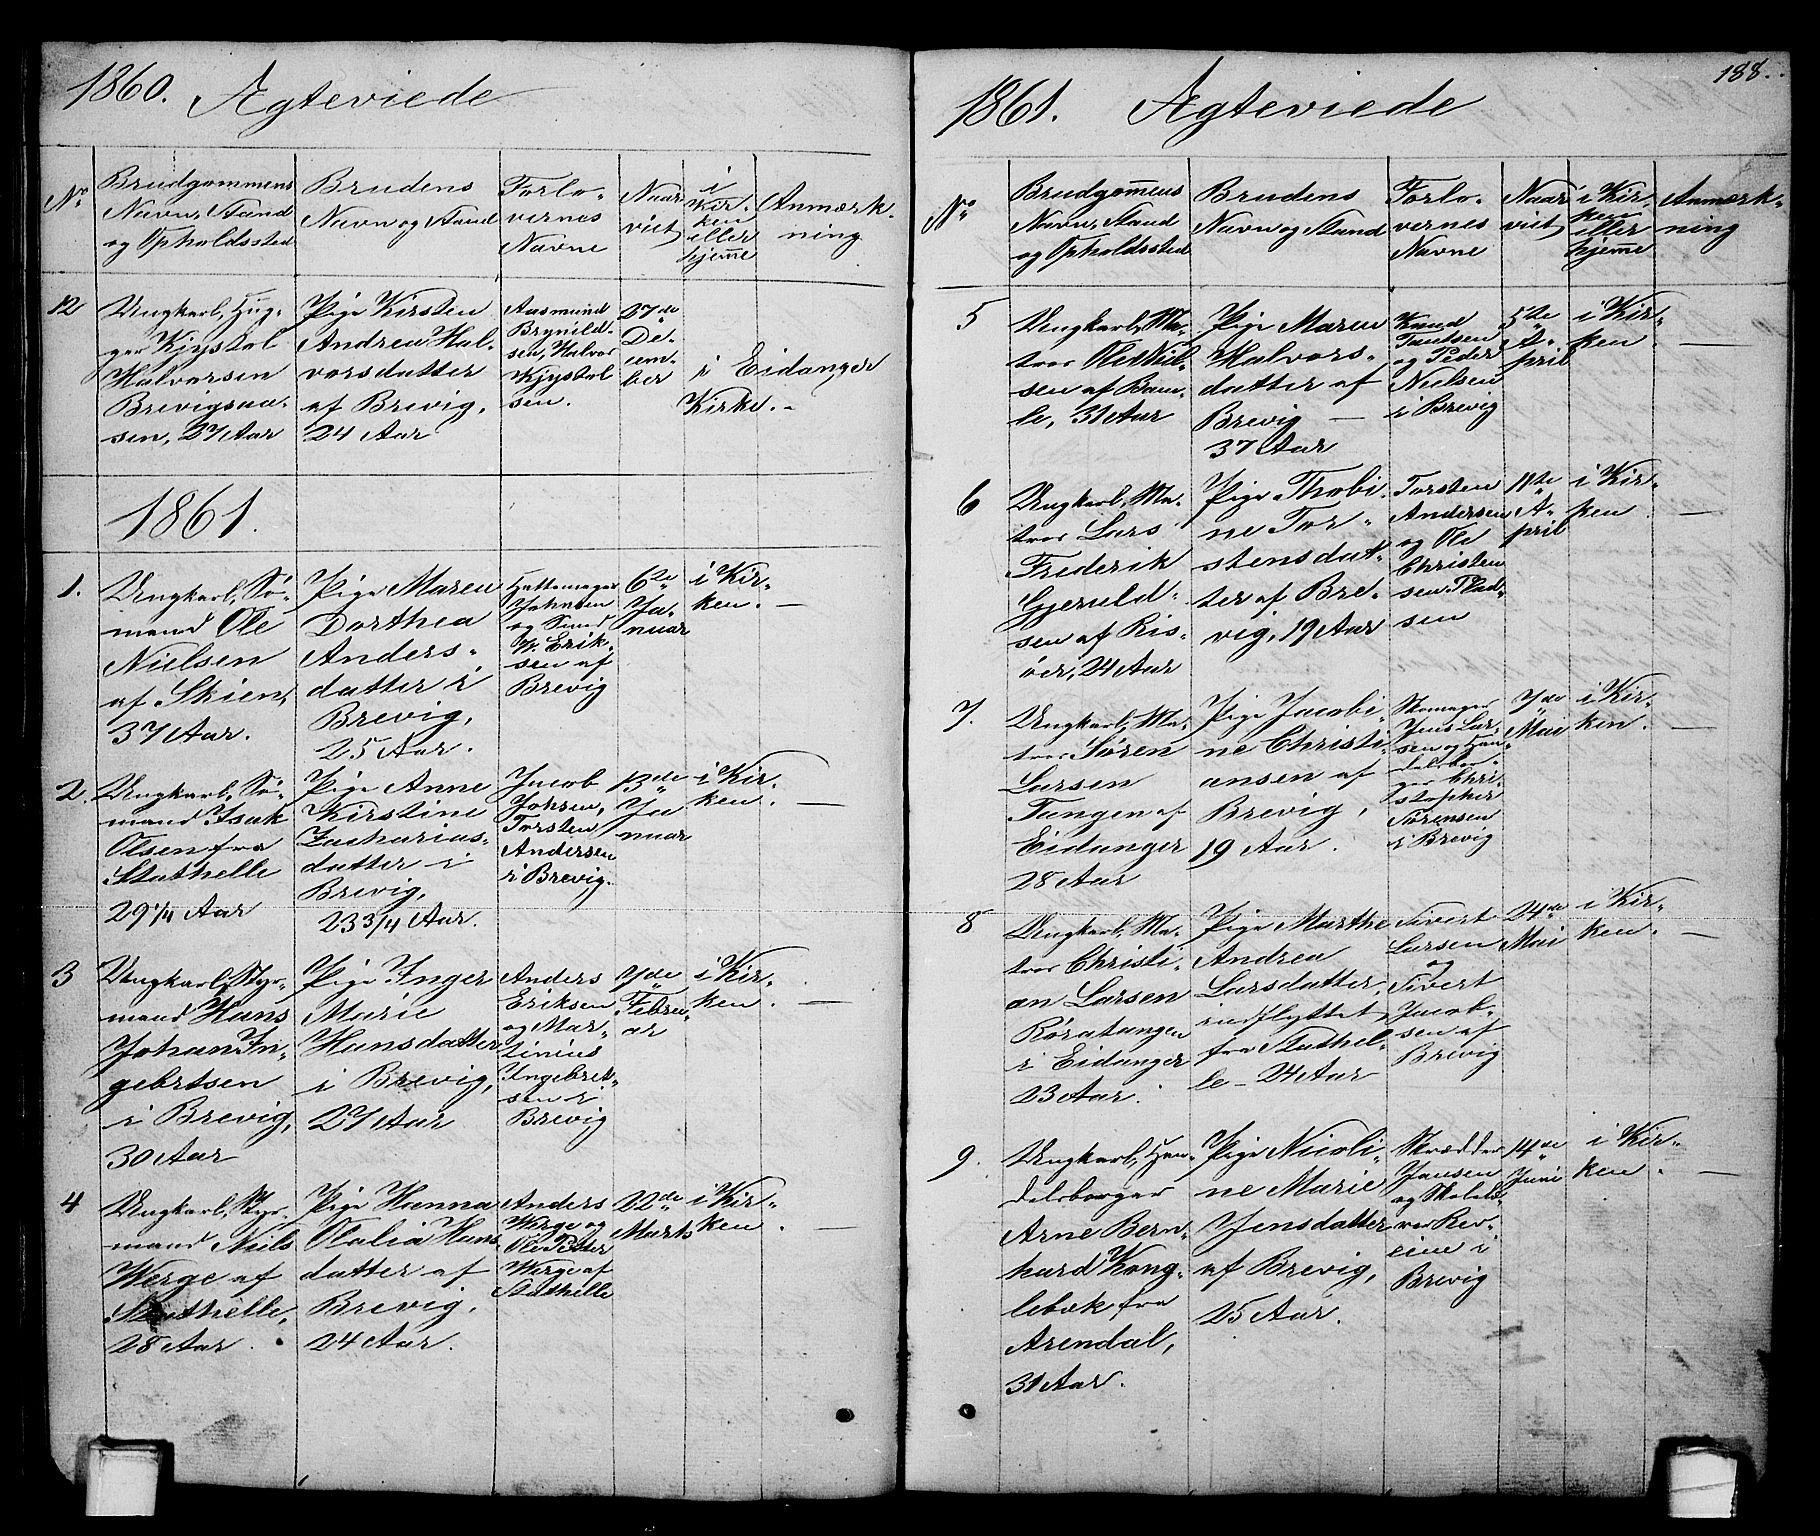 SAKO, Brevik kirkebøker, G/Ga/L0002: Klokkerbok nr. 2, 1846-1865, s. 188